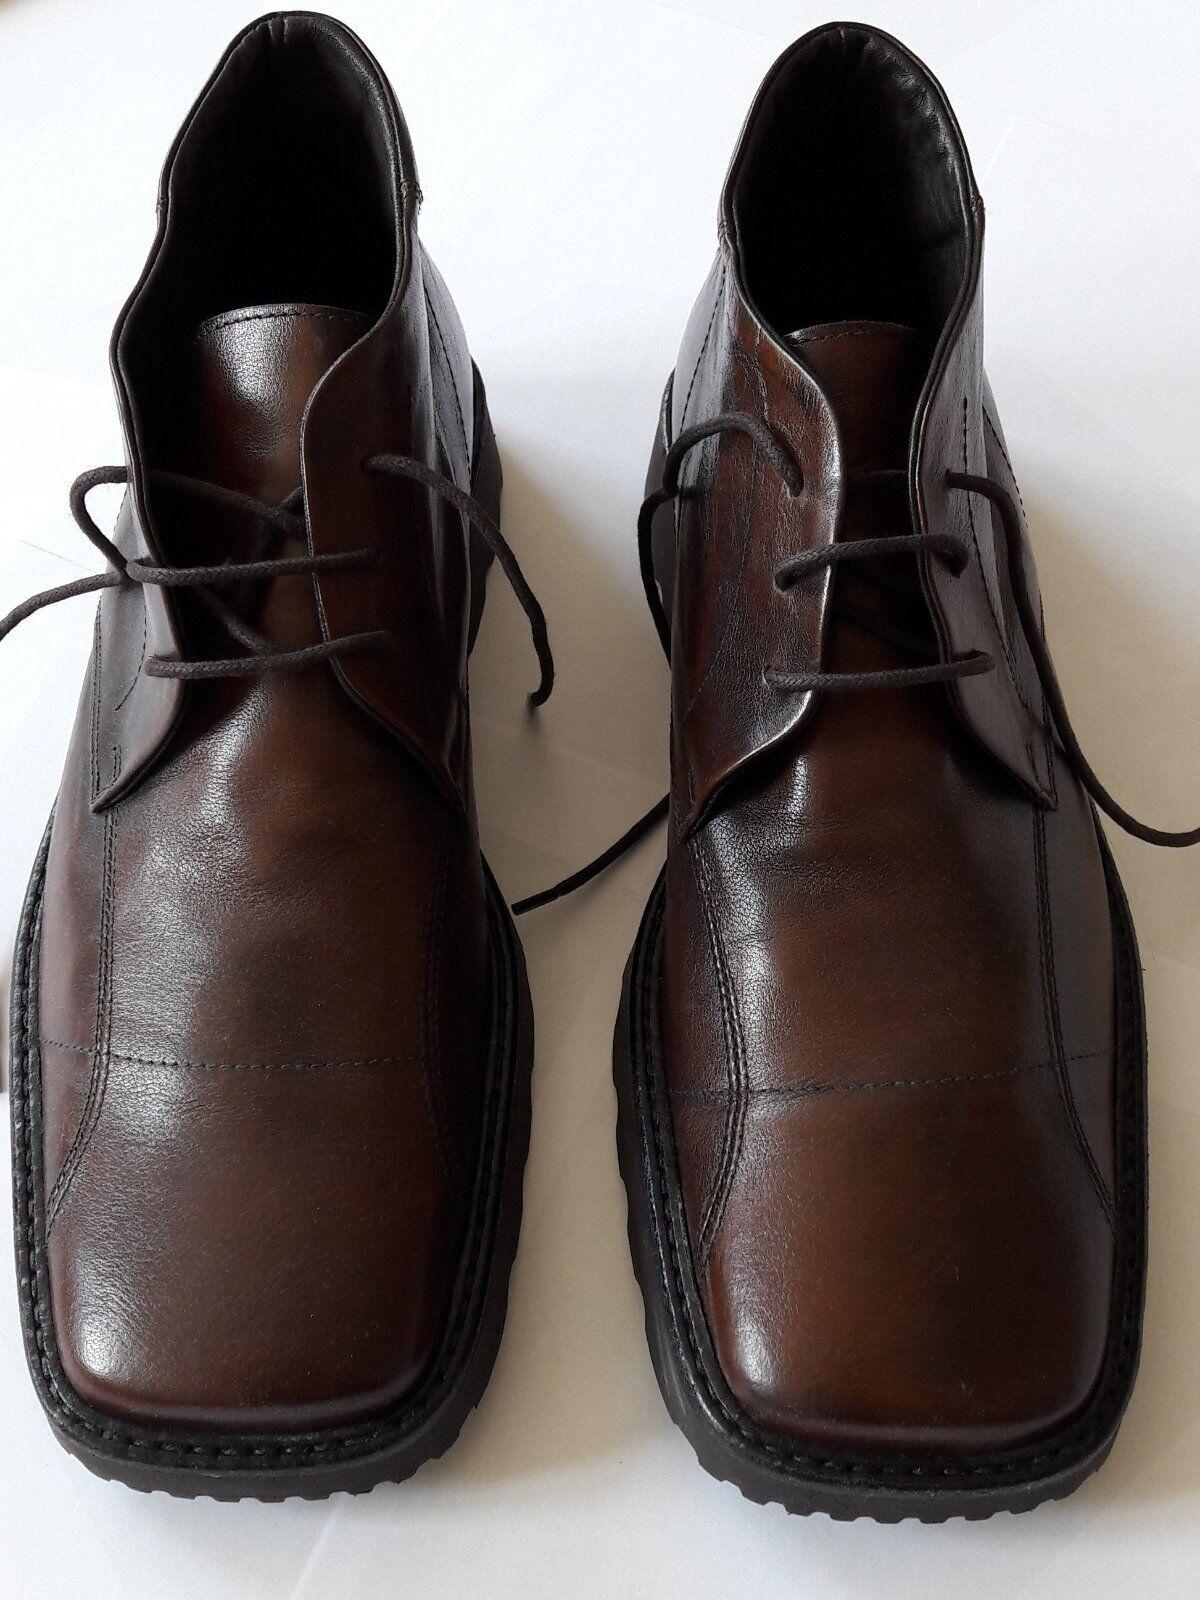 Rowland Brothers Herrenschuhe Gr.44 braun Leder